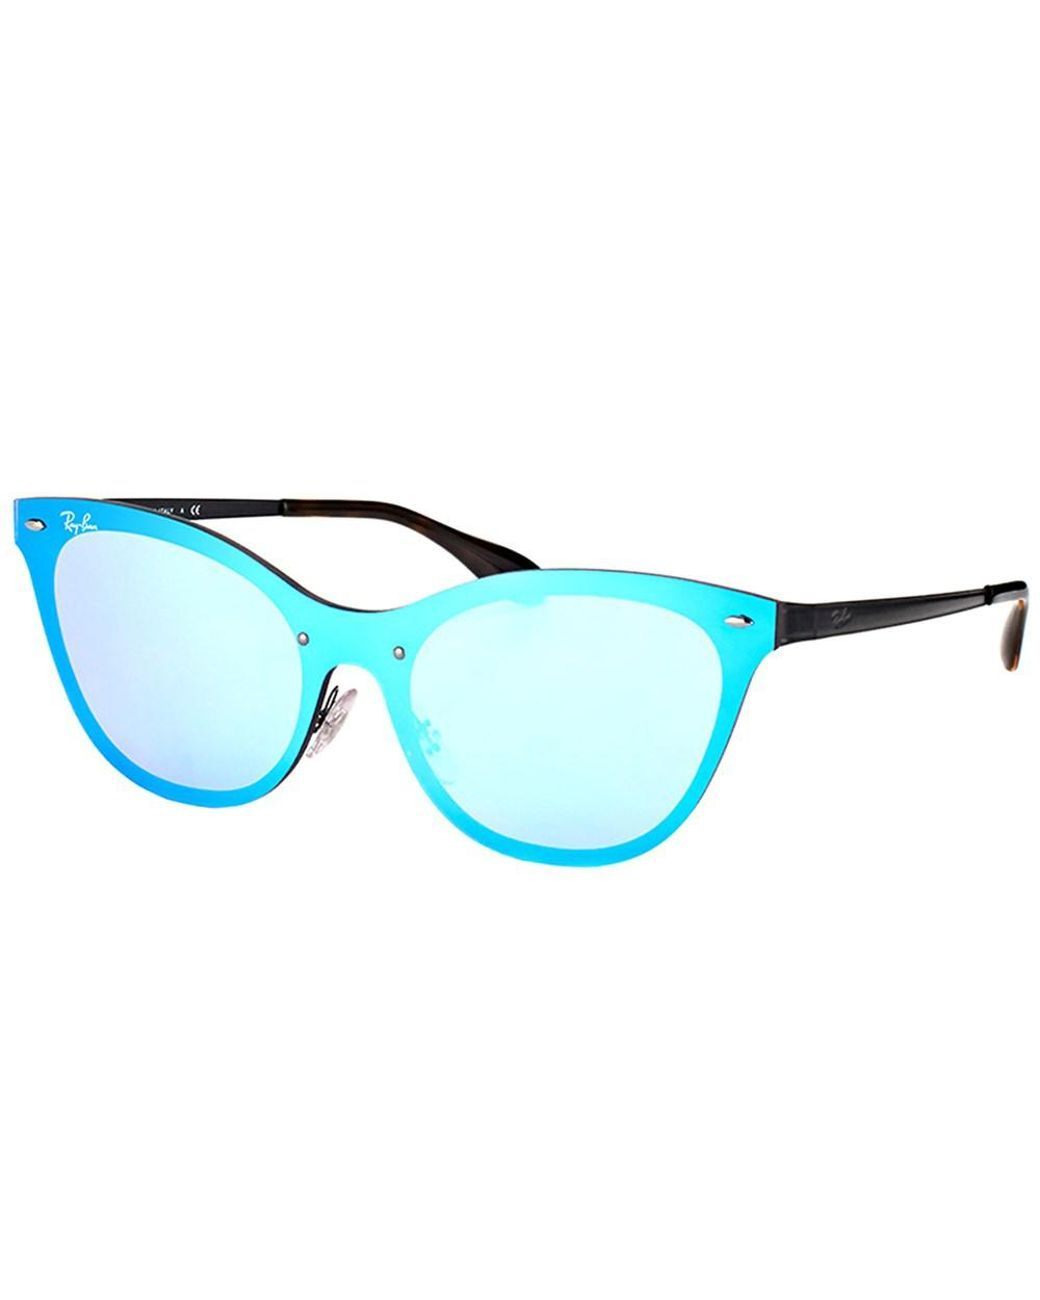 ac367ae5d7 Ray-Ban - Blaze Cat-eye Rb 3580n 153 7v Black Sunglasses - Lyst ...